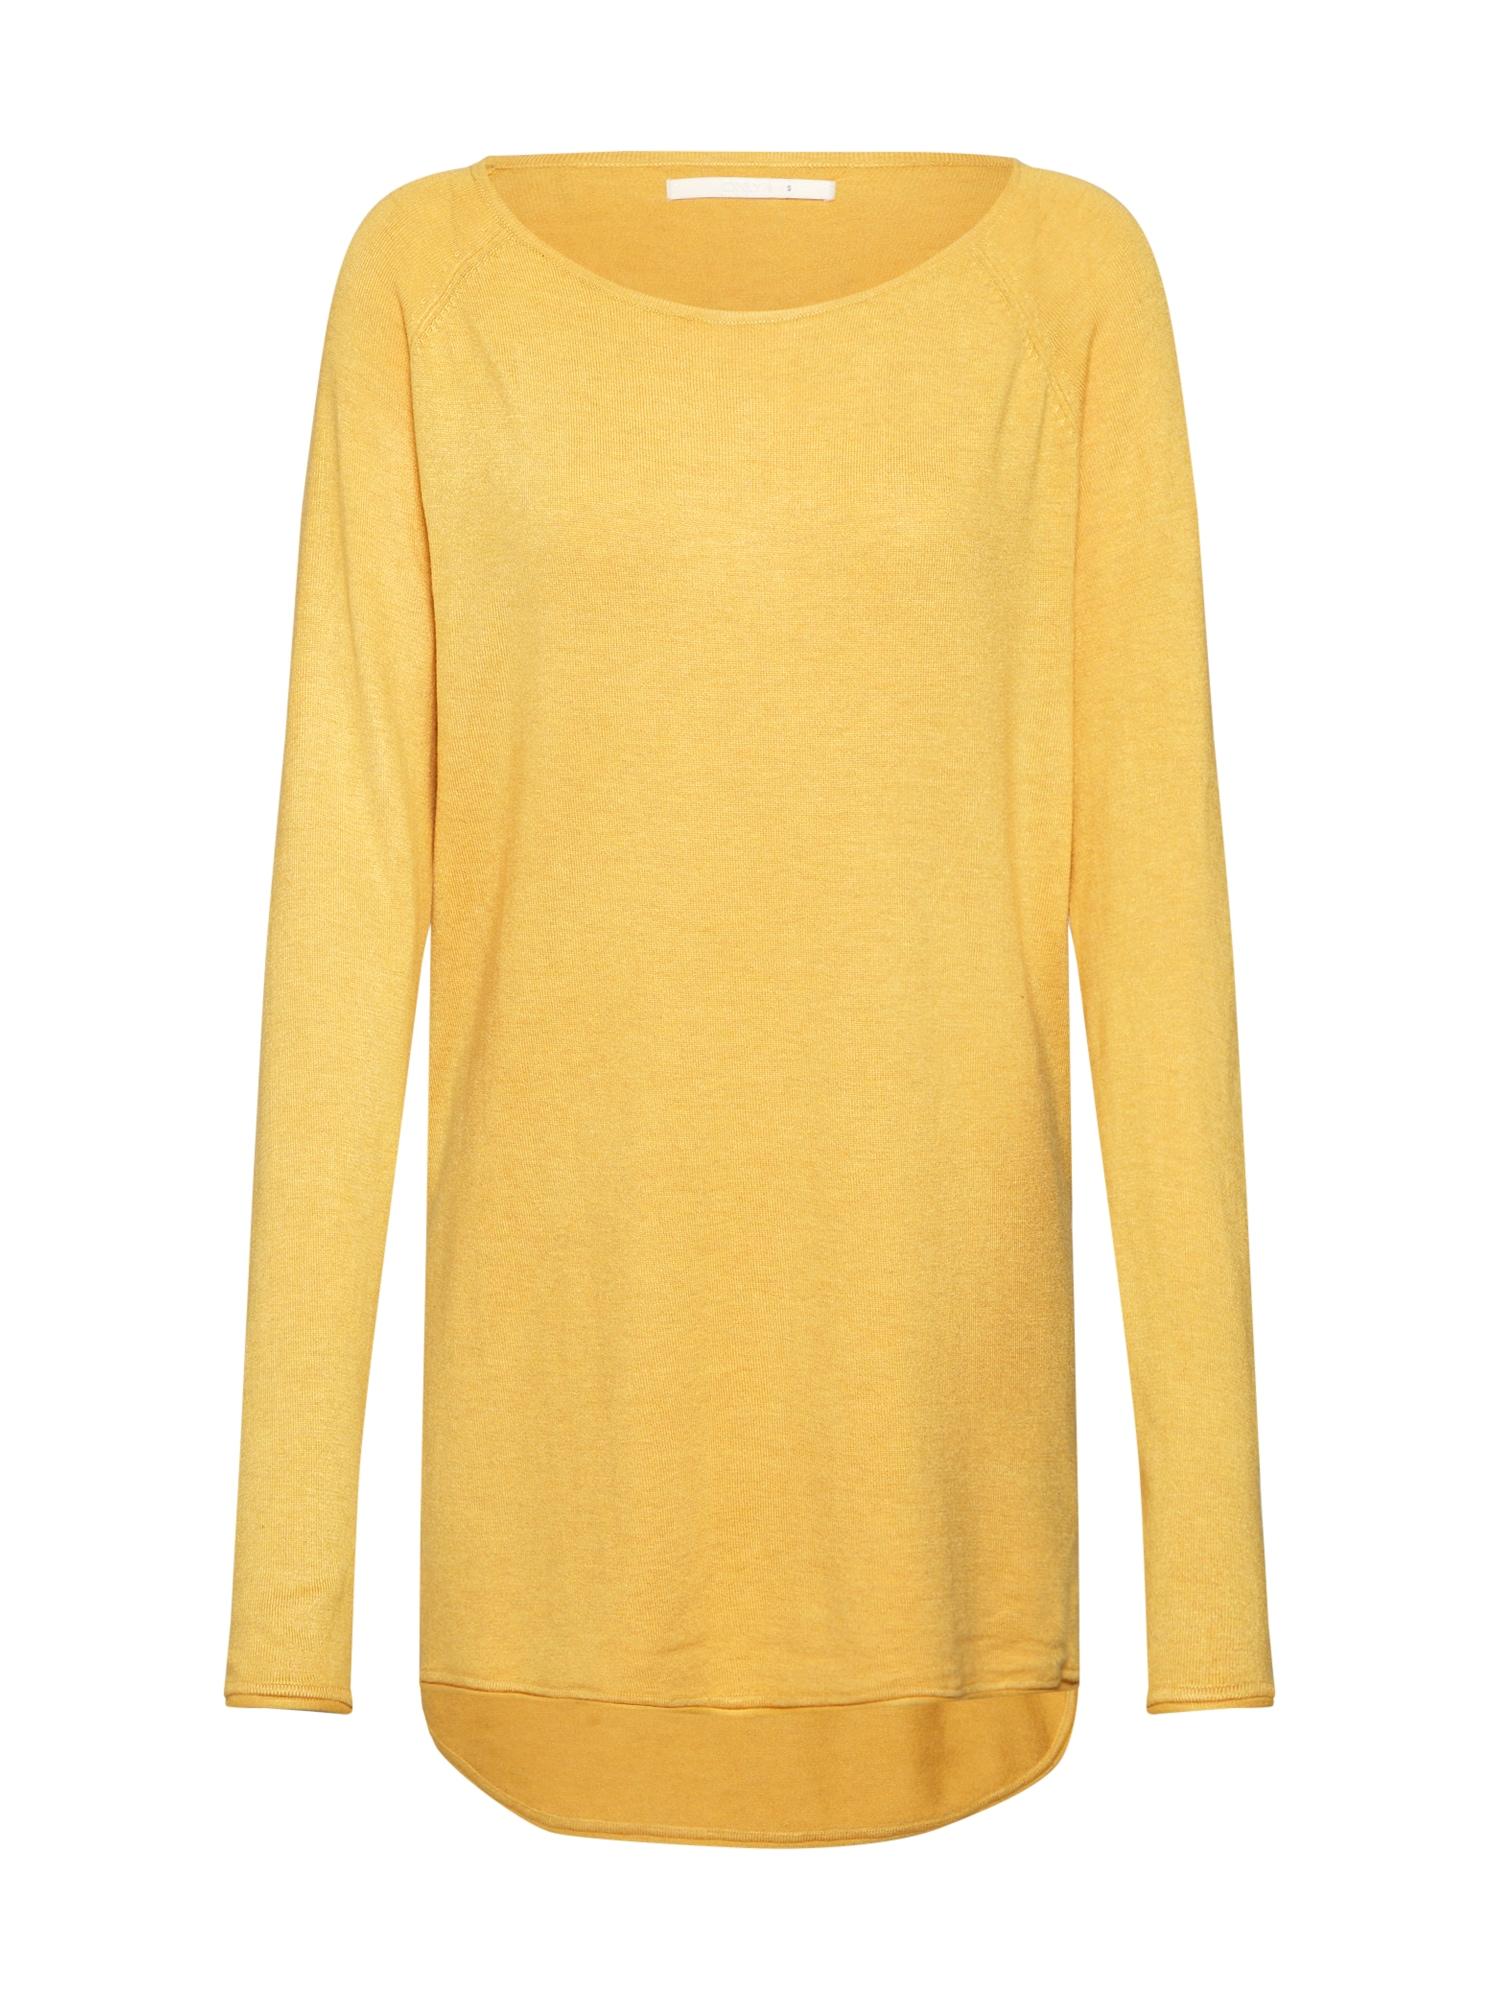 ONLY Sveter 'Mila'  žlté